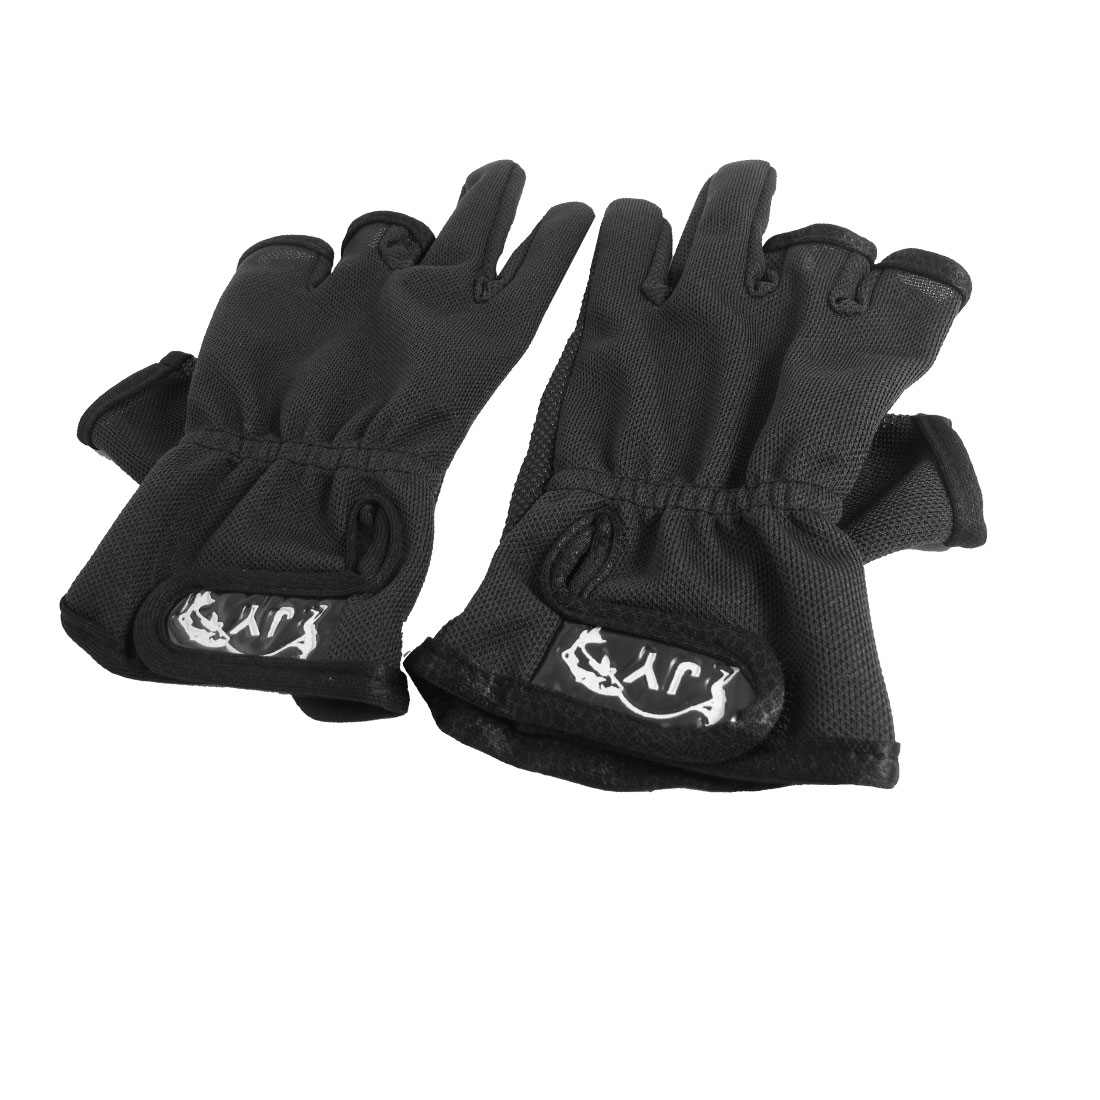 Pair Hook Loop Closure 3 Cut Finger Antislip Dots Palm Fishing Gloves Black for Fisherman